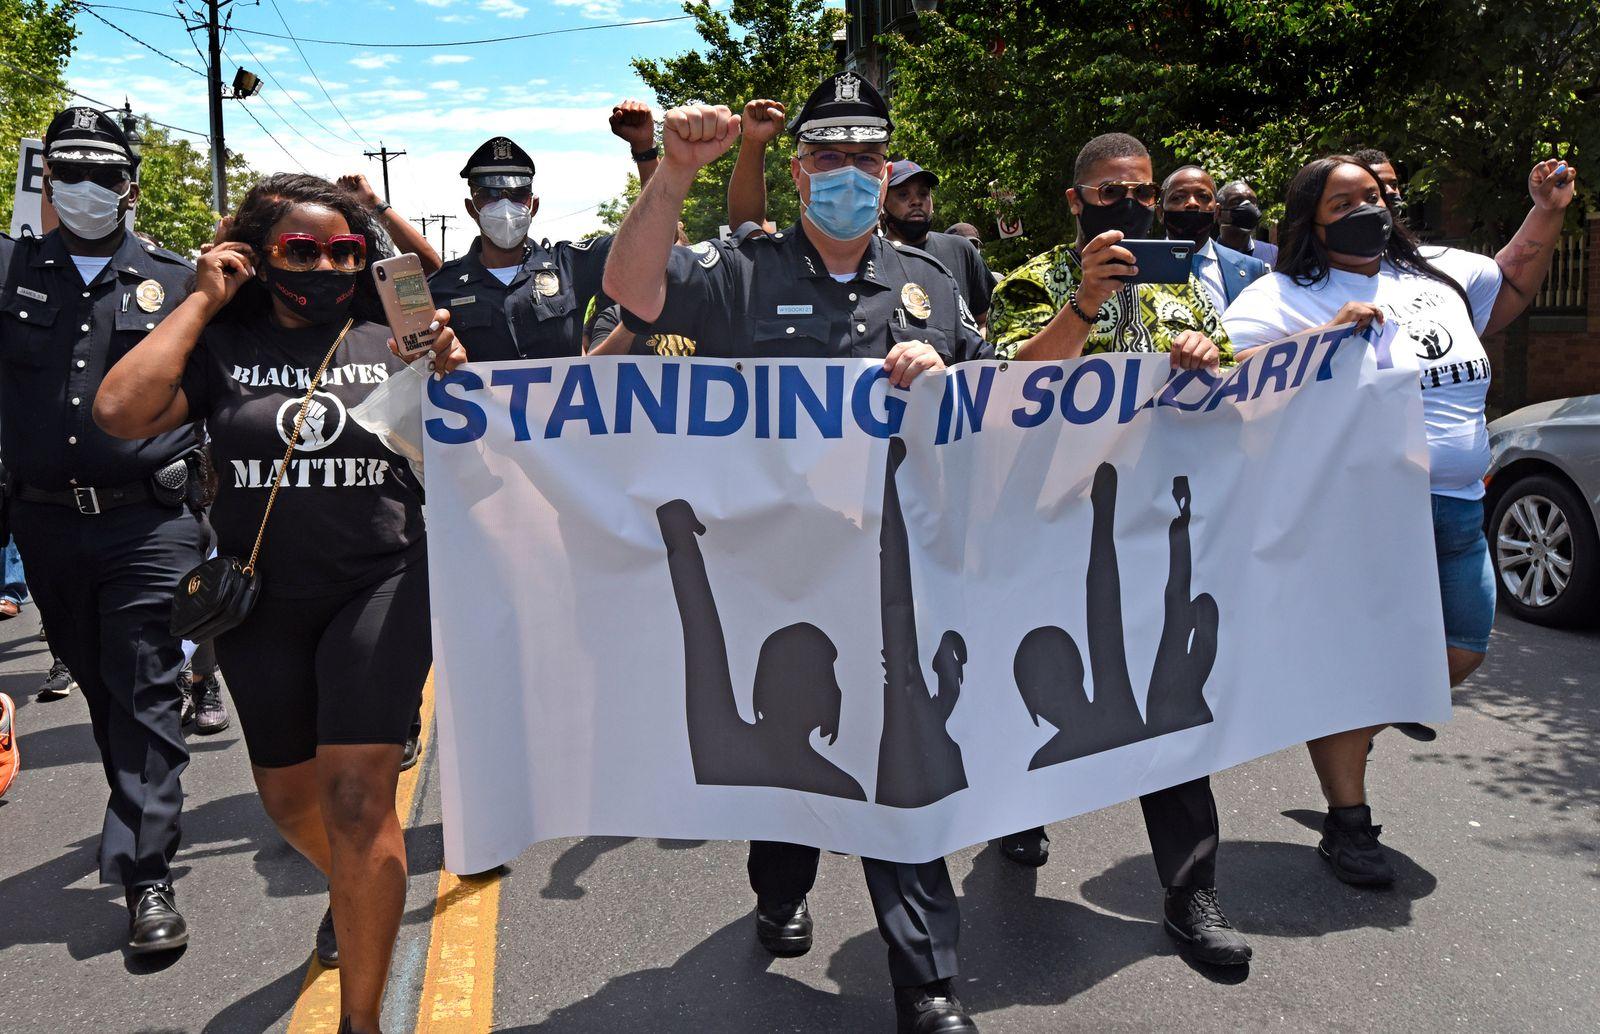 APTOPIX America Protests Police Praise